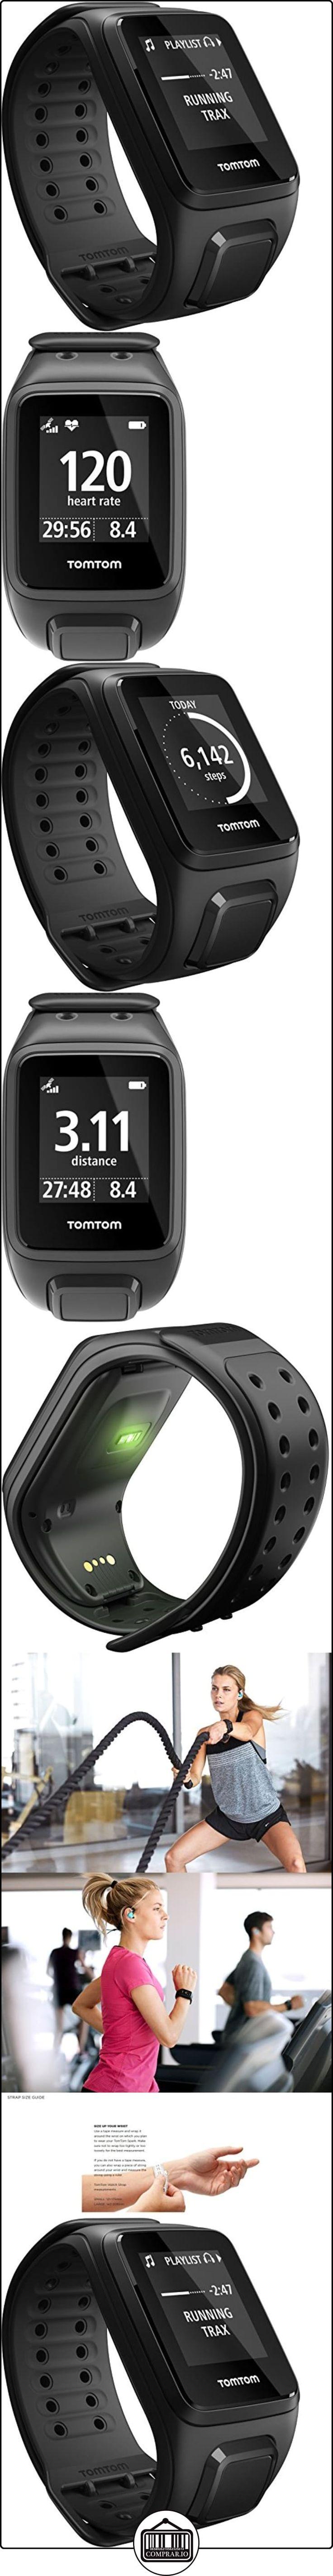 TomTom Spark Cardio - Reloj deportivo, talla grande, color negro  ✿ Relojes para hombre - (Gama media/alta) ✿